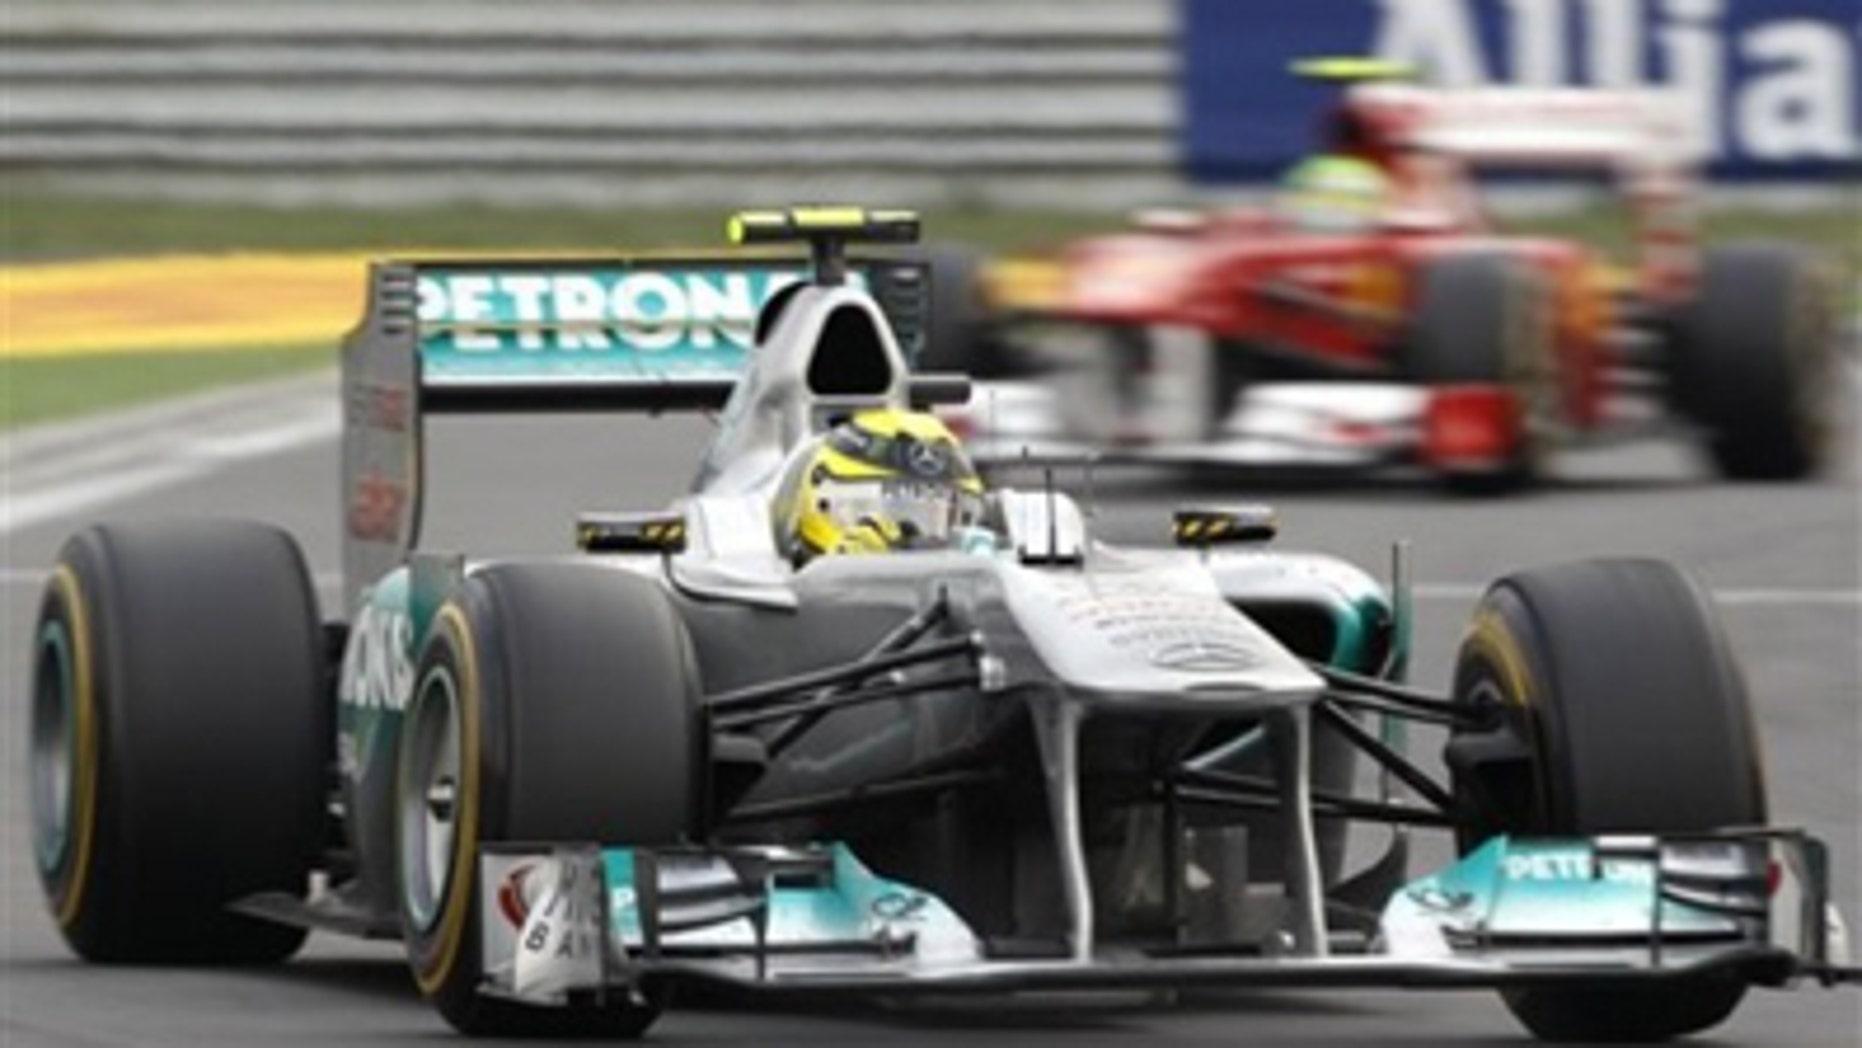 Mercedes GP driver Nico Rosberg competing in the 2011 Korean Grand Prix